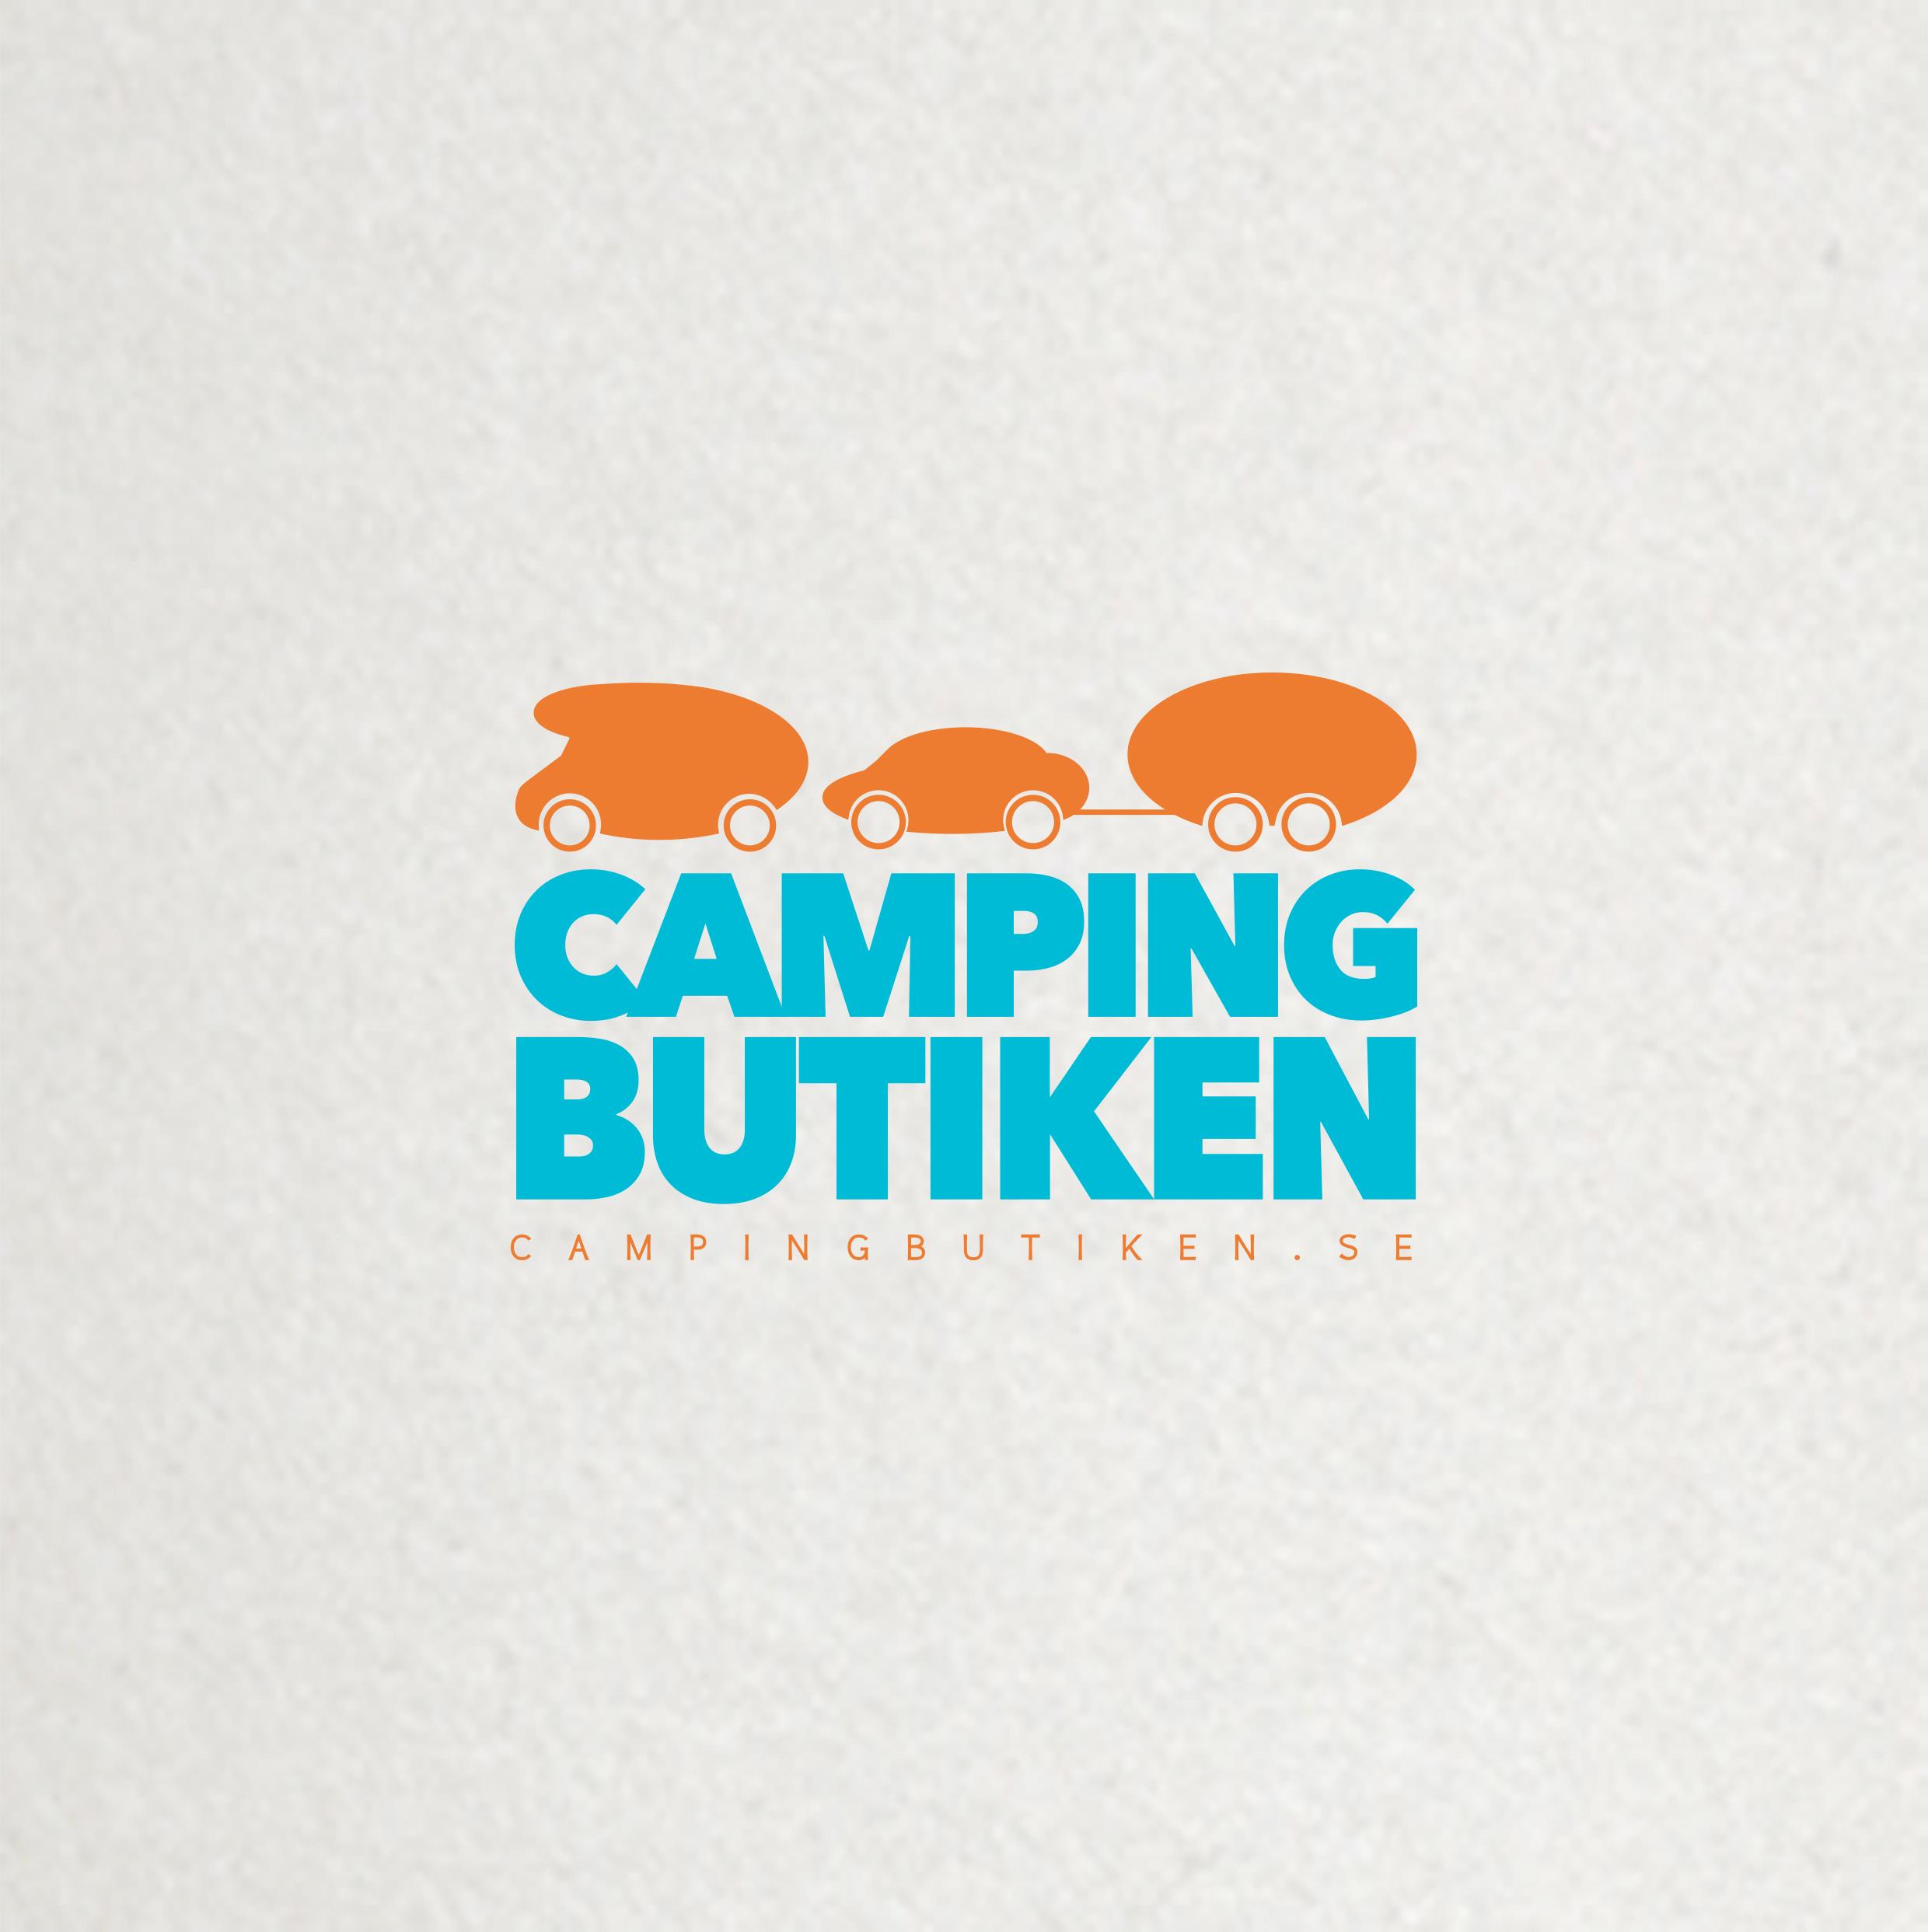 Campingbutiken